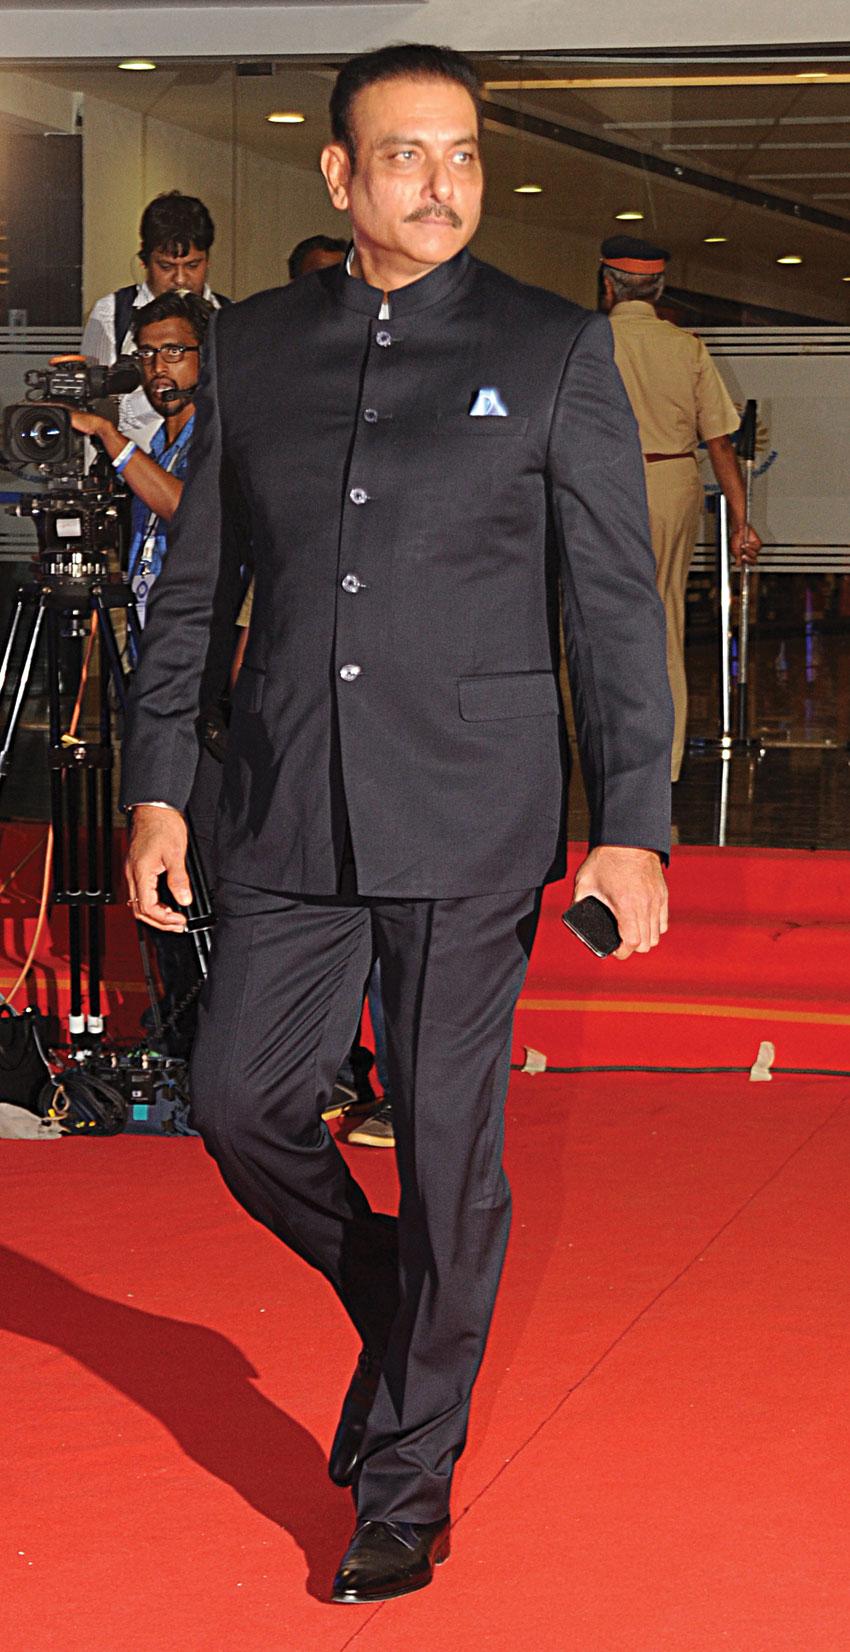 File photo of Indian Cricket Team Director Ravi Shastri, in Mumbai, April 8. (Sujit Jaiswal | AFP | Getty Images)